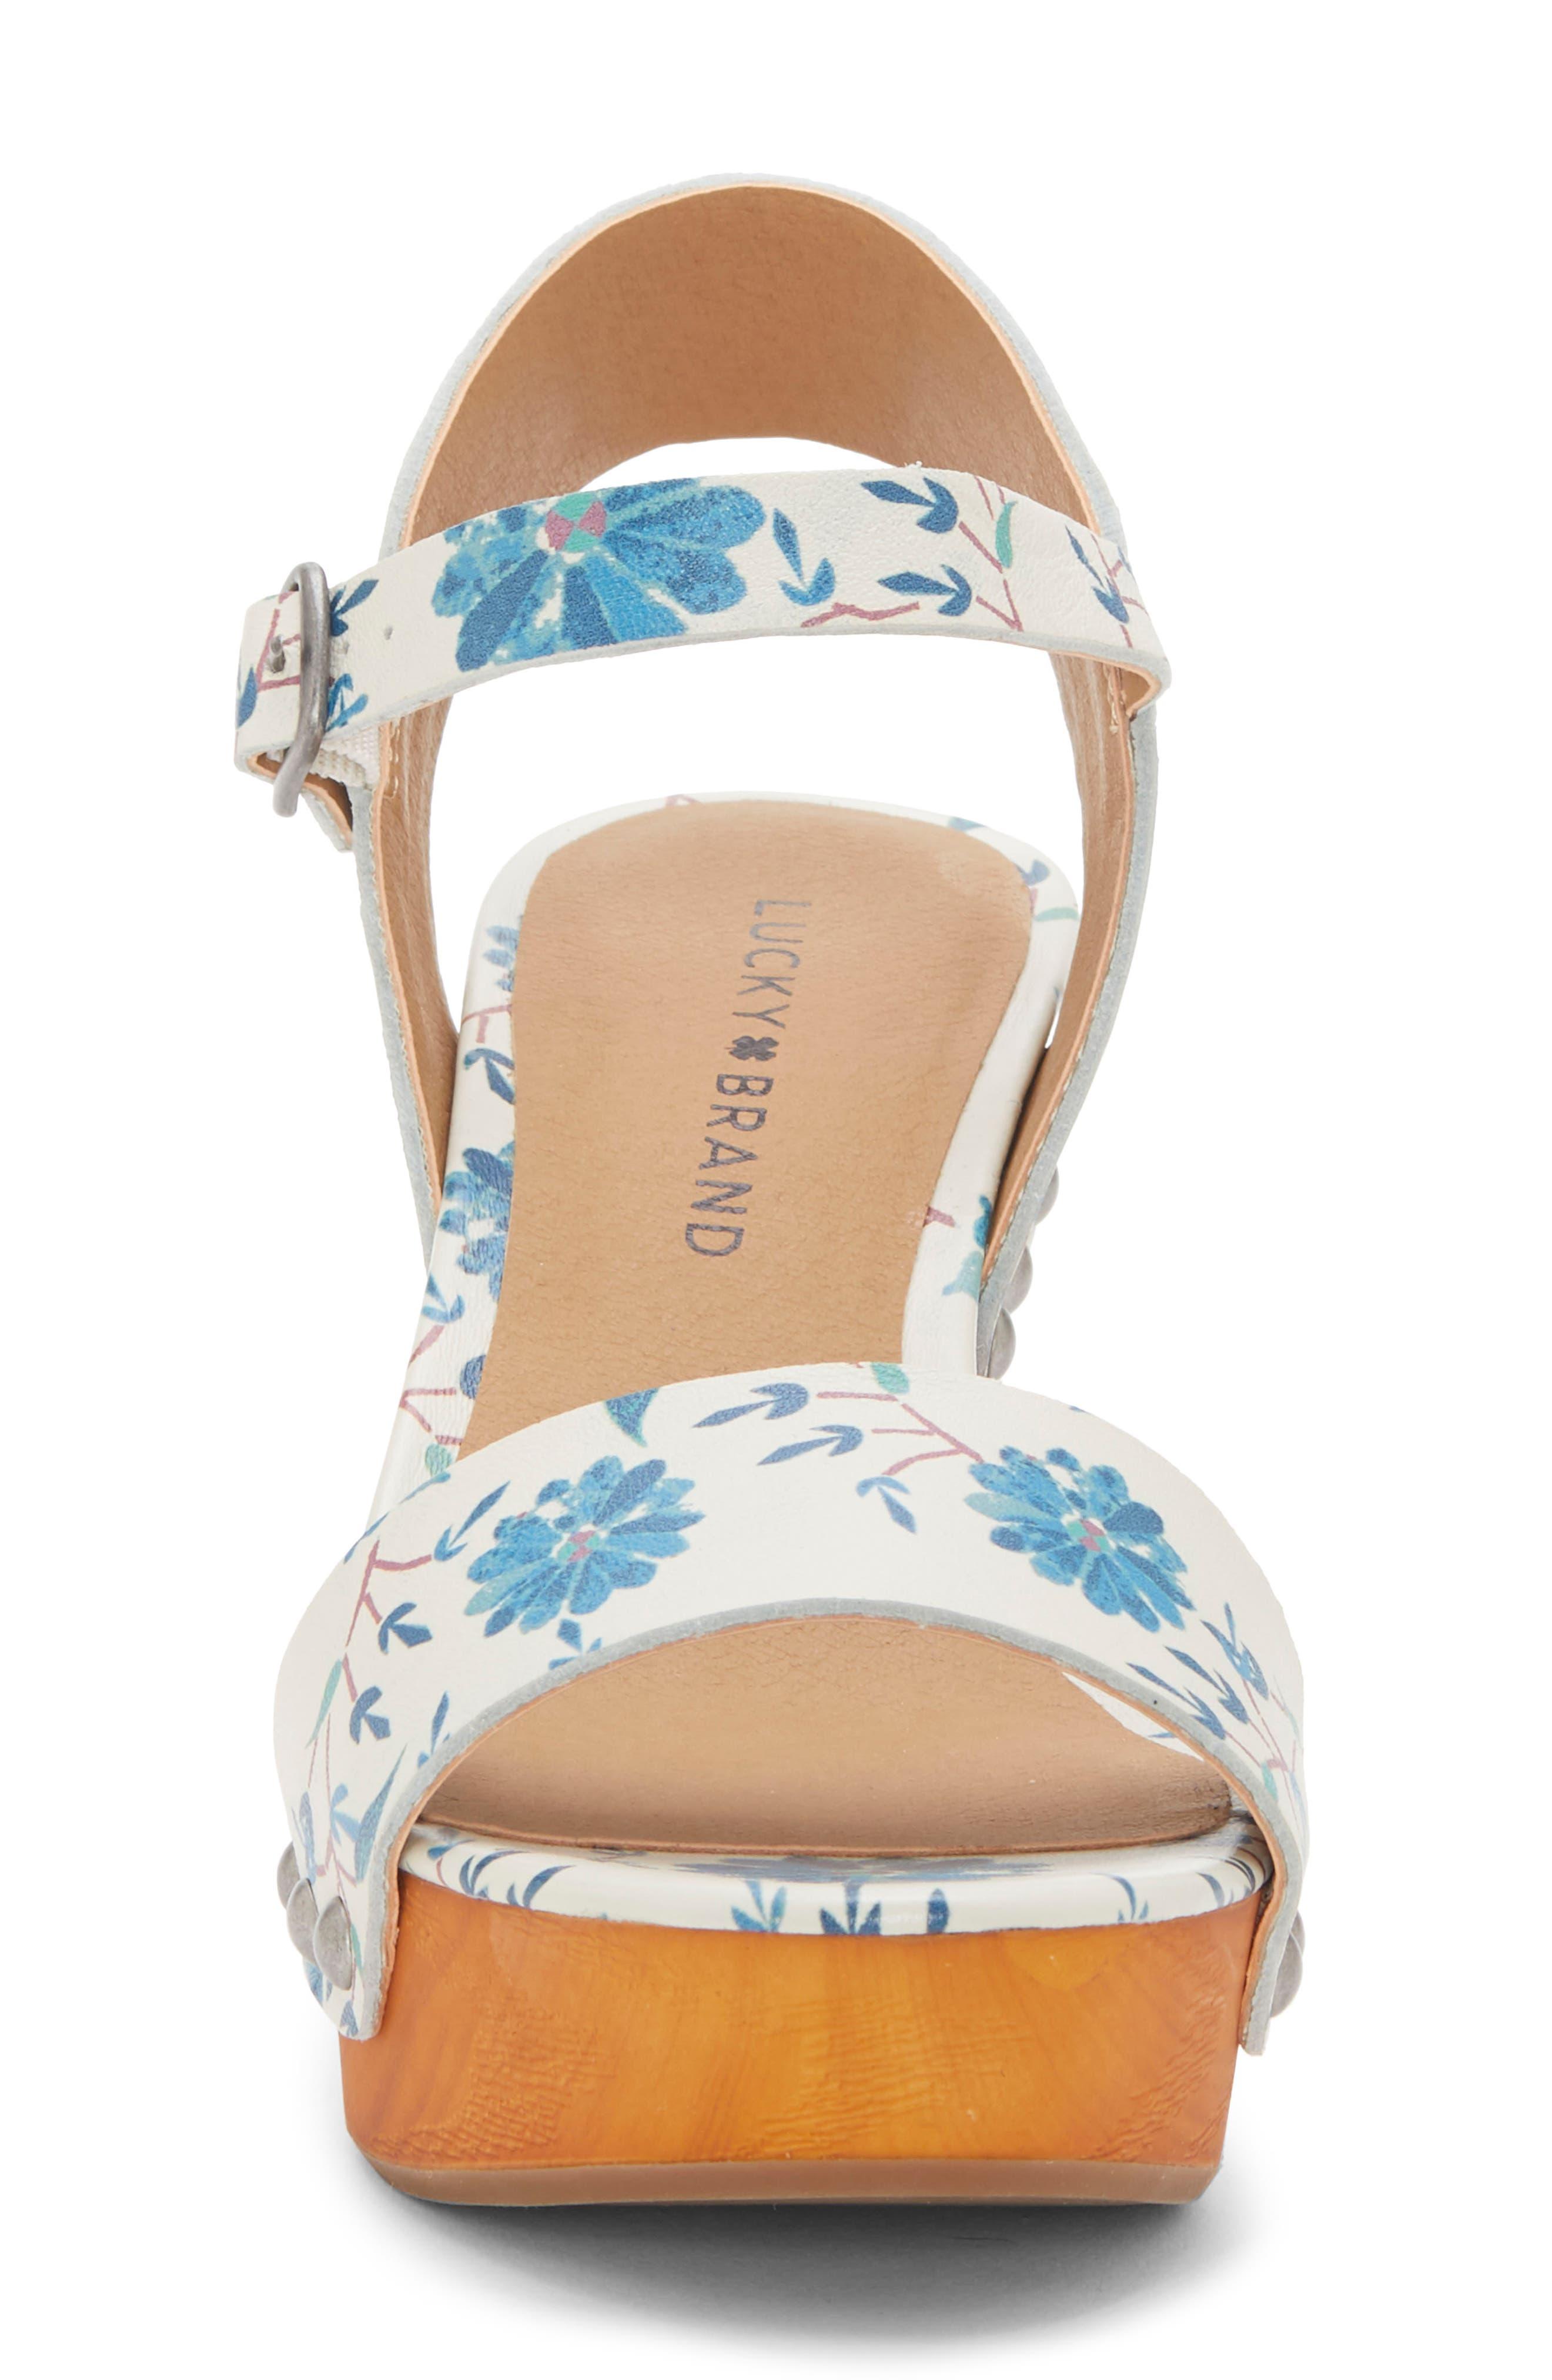 LUCKY BRAND, Trisa Platform Sandal, Alternate thumbnail 4, color, BIRCH LEATHER